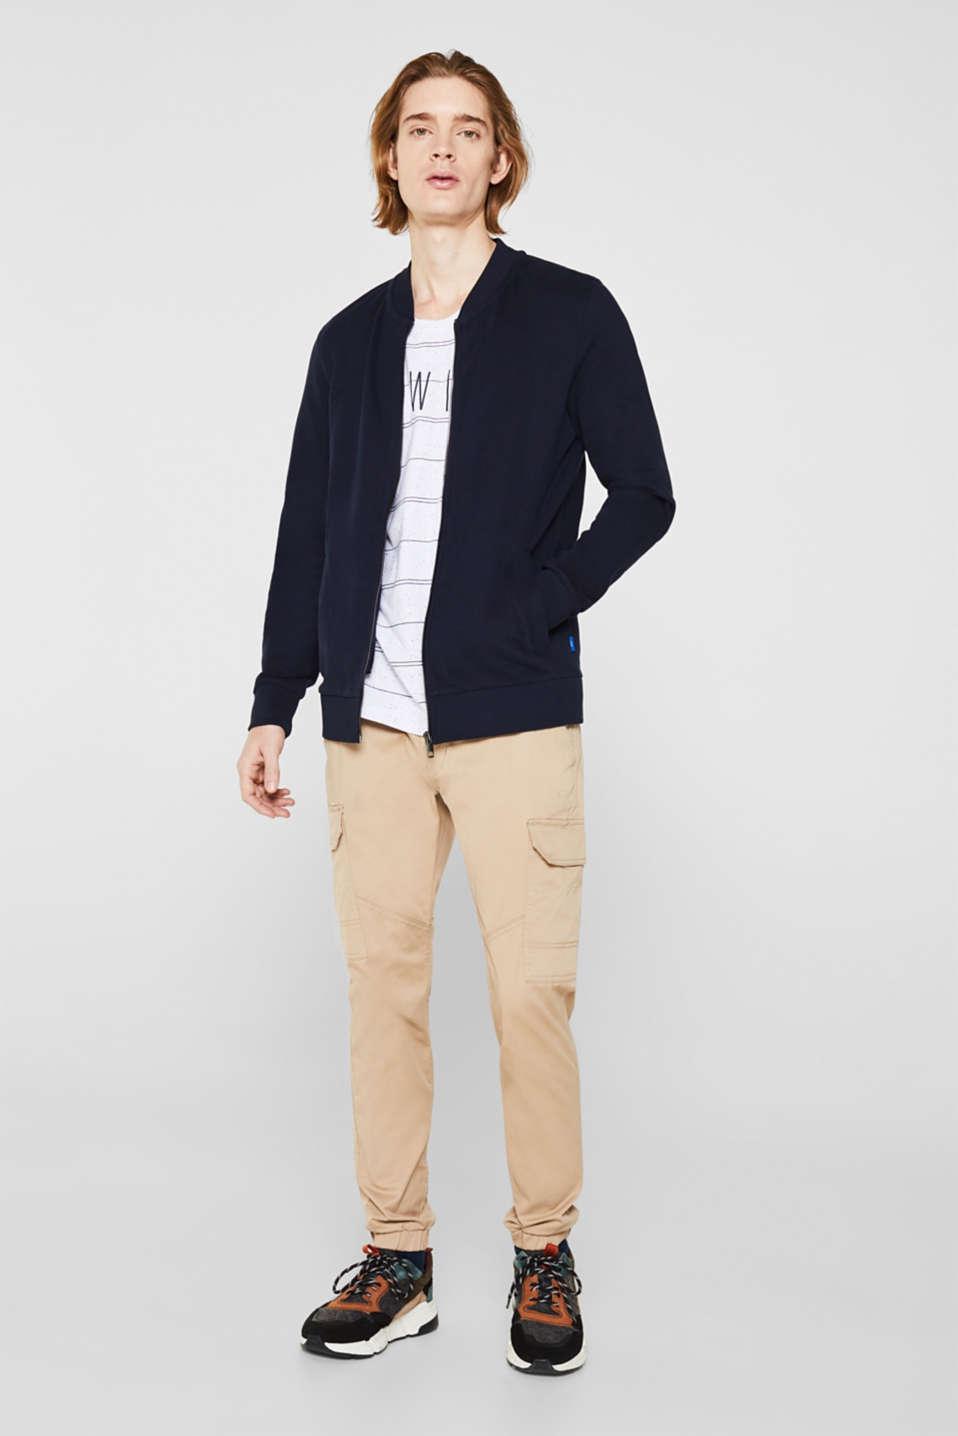 Bomber-style sweatshirt jacket, 100% cotton, NAVY, detail image number 1